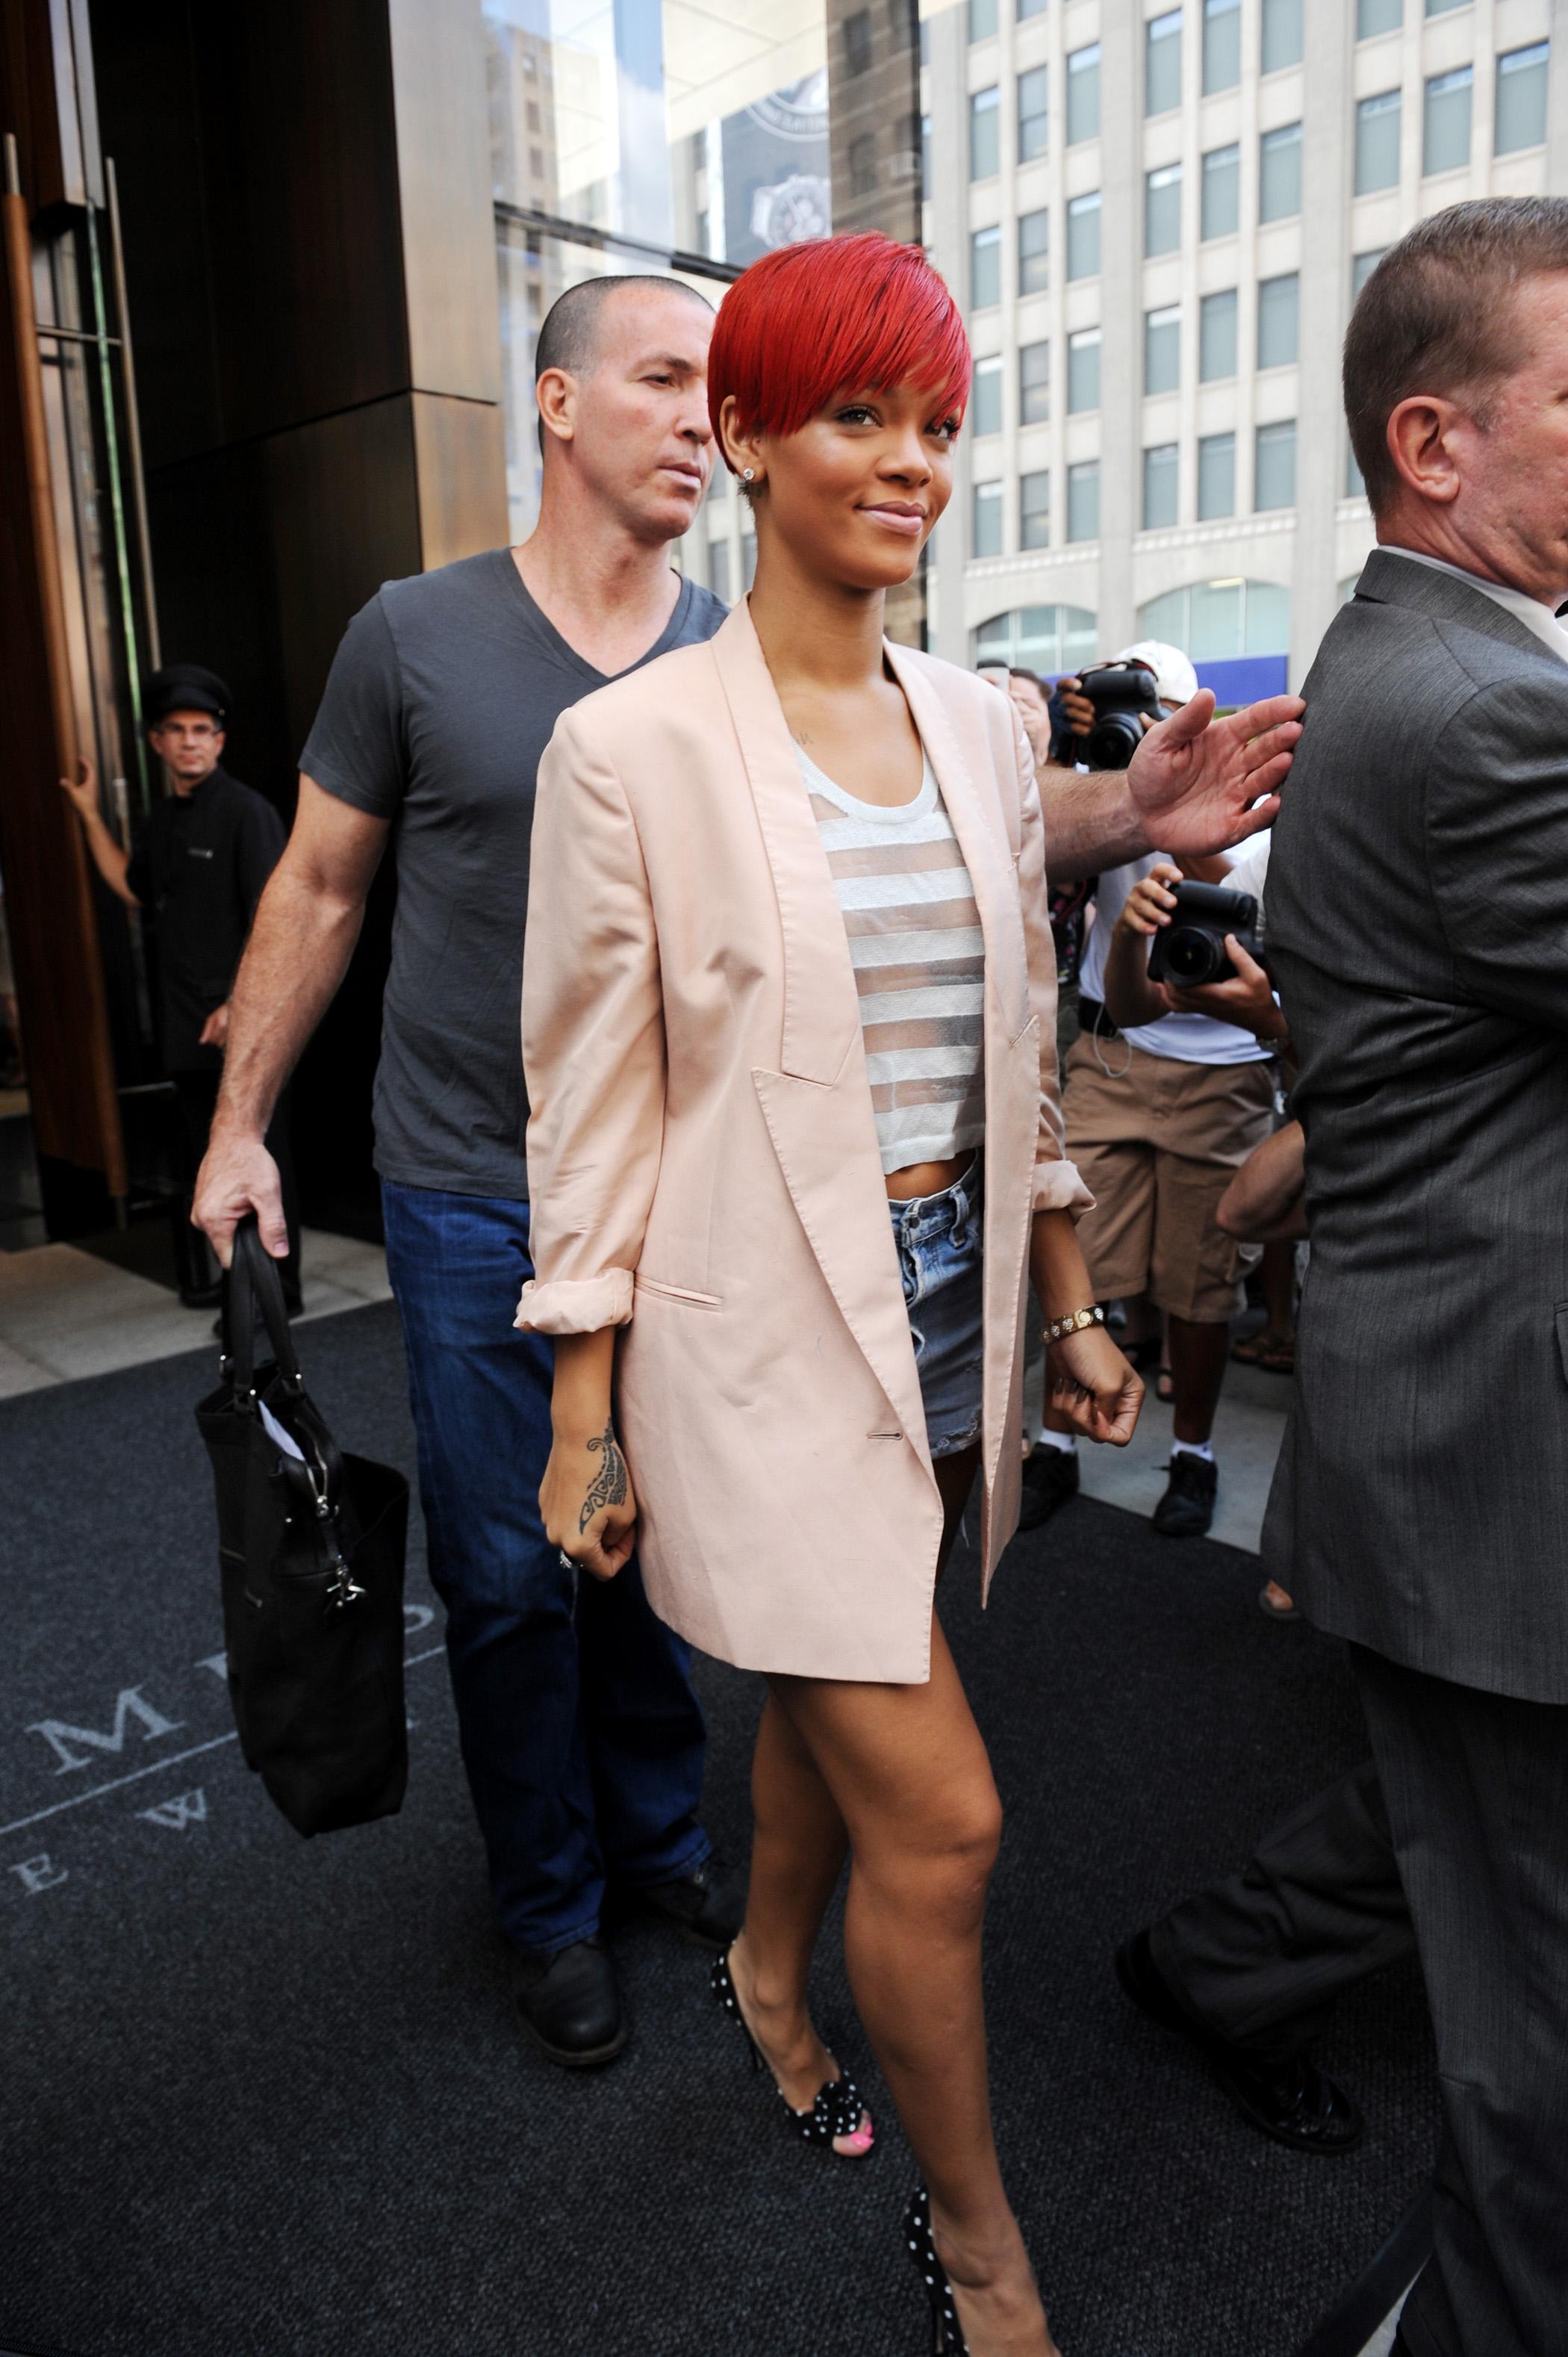 11511_Rihanna2010_08_11_leavestheTrumpSohohotelinNY.com_TheElder_Rihanna2010_08_11_leavestheTrumpSohohotelinNY18_122_206lo.jpg